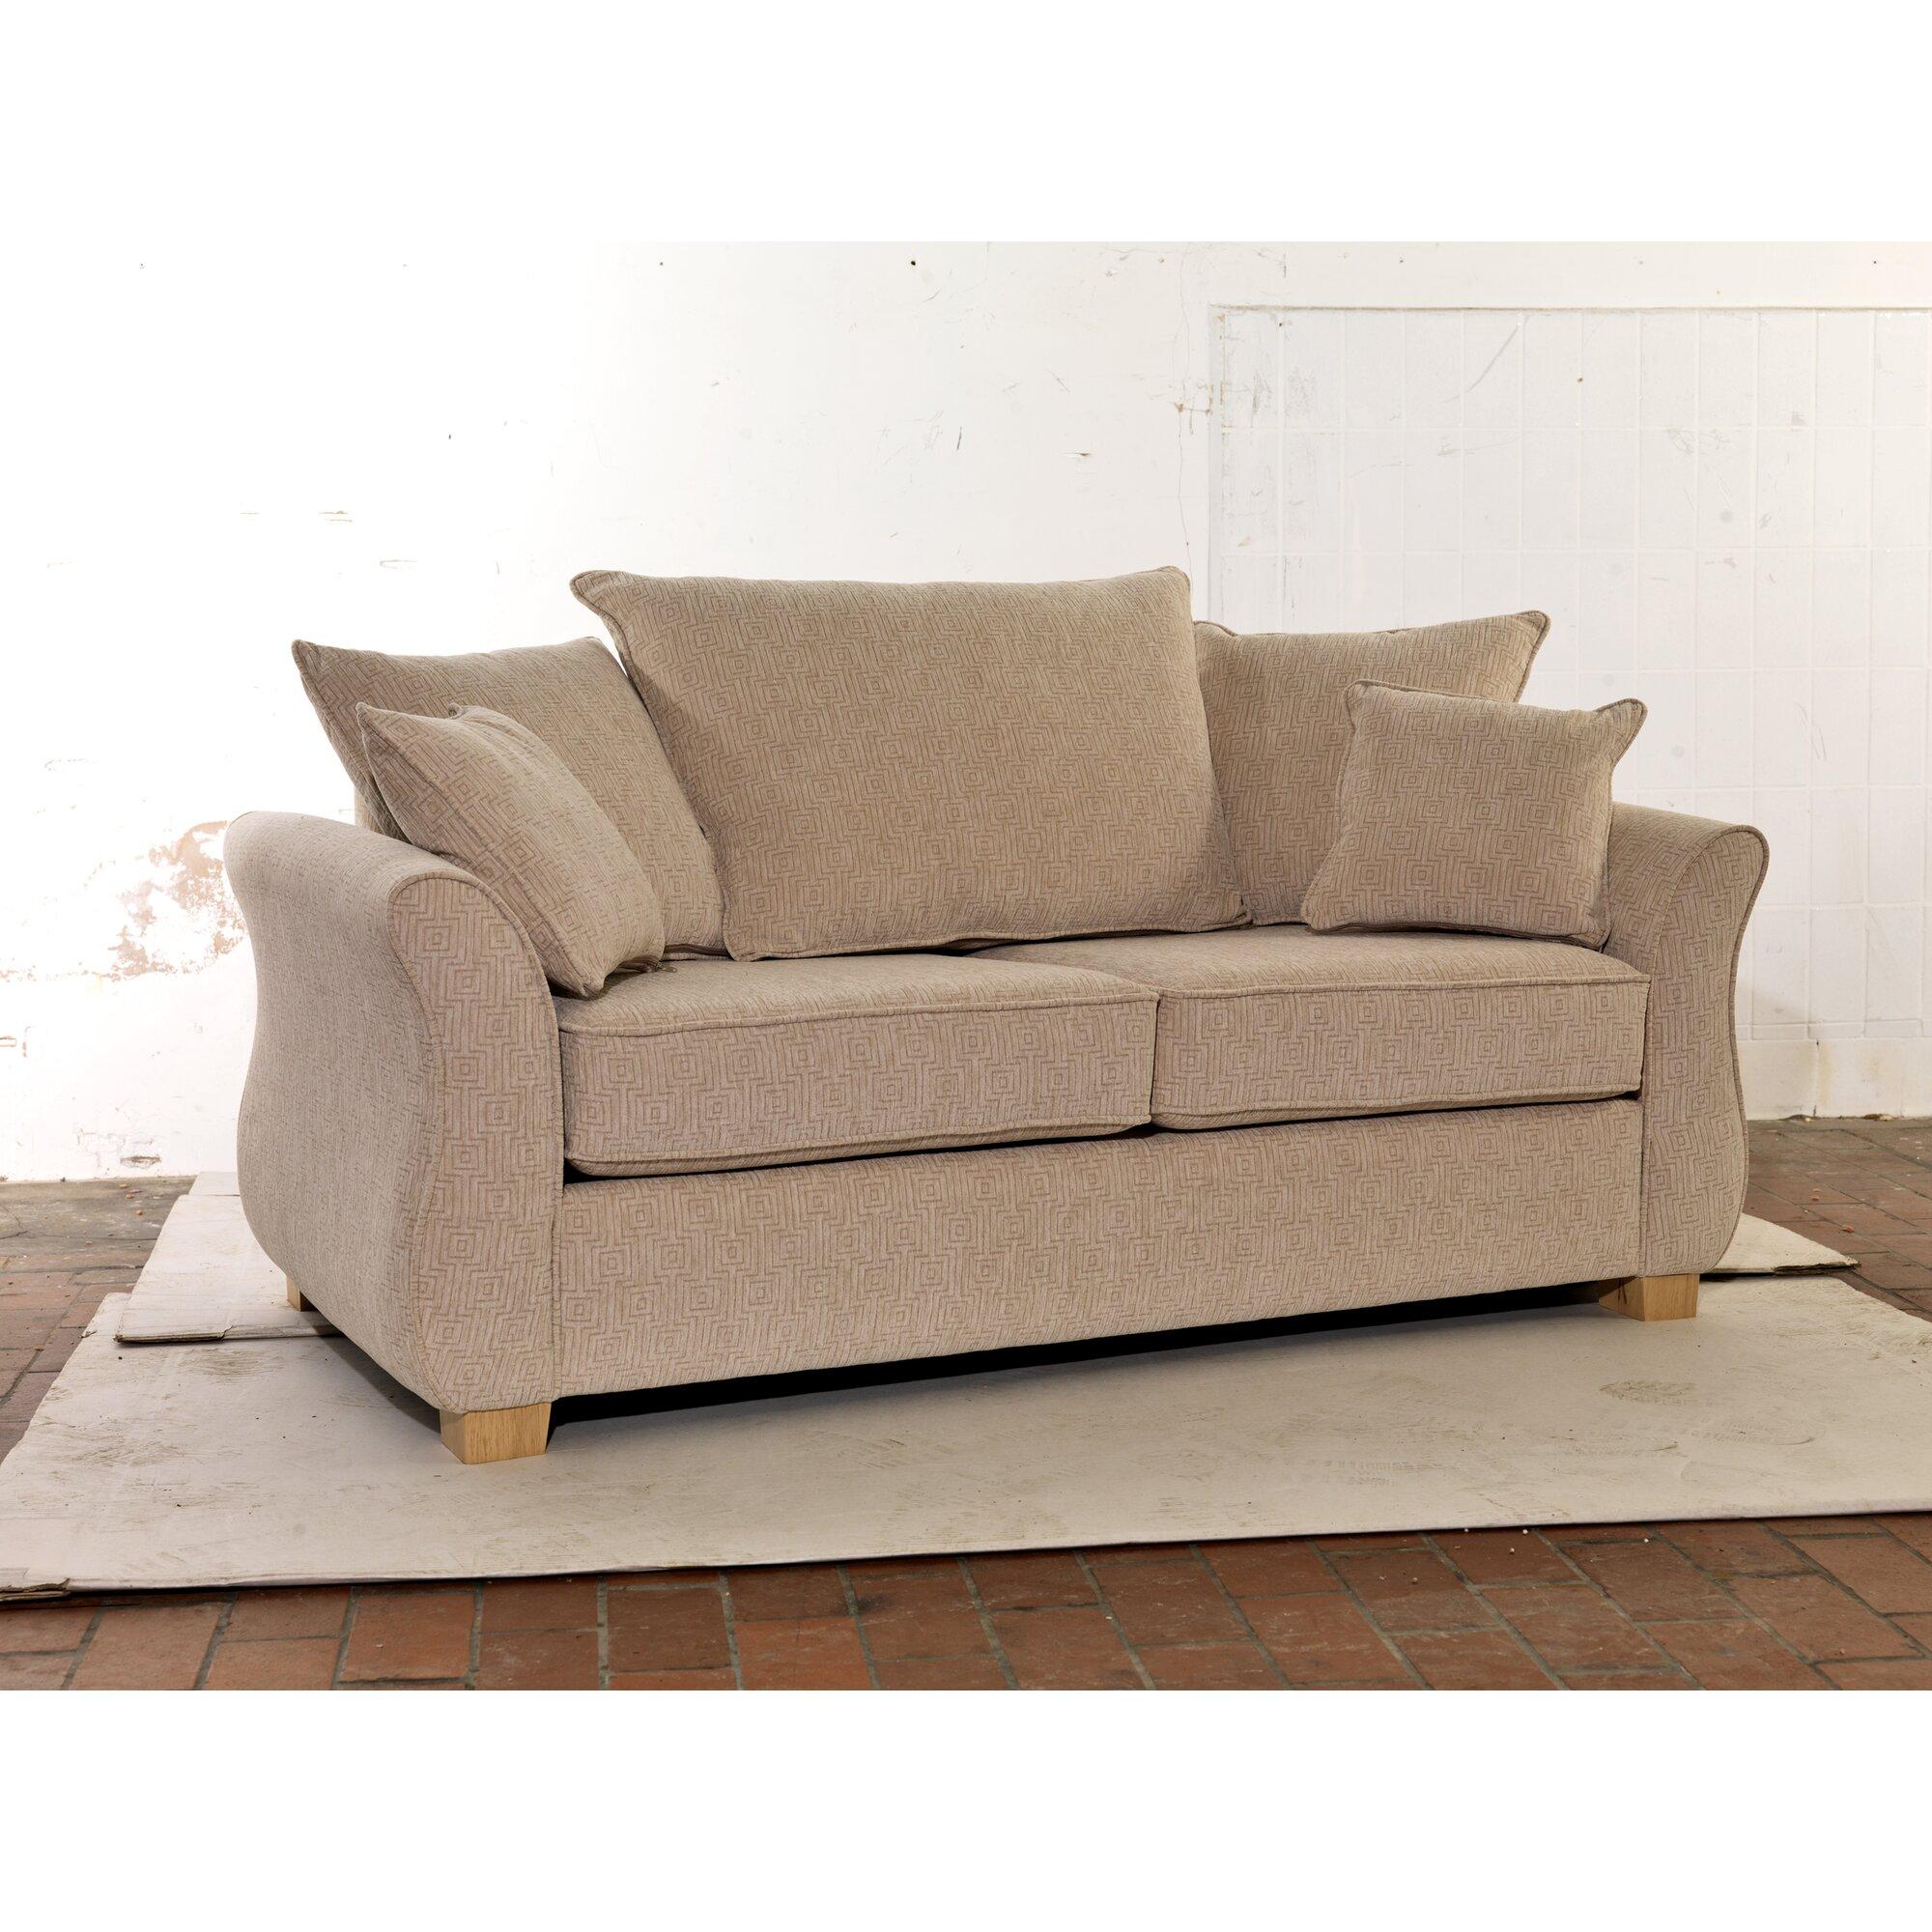 uk icon design 2 sitzer schlafsofa regal. Black Bedroom Furniture Sets. Home Design Ideas